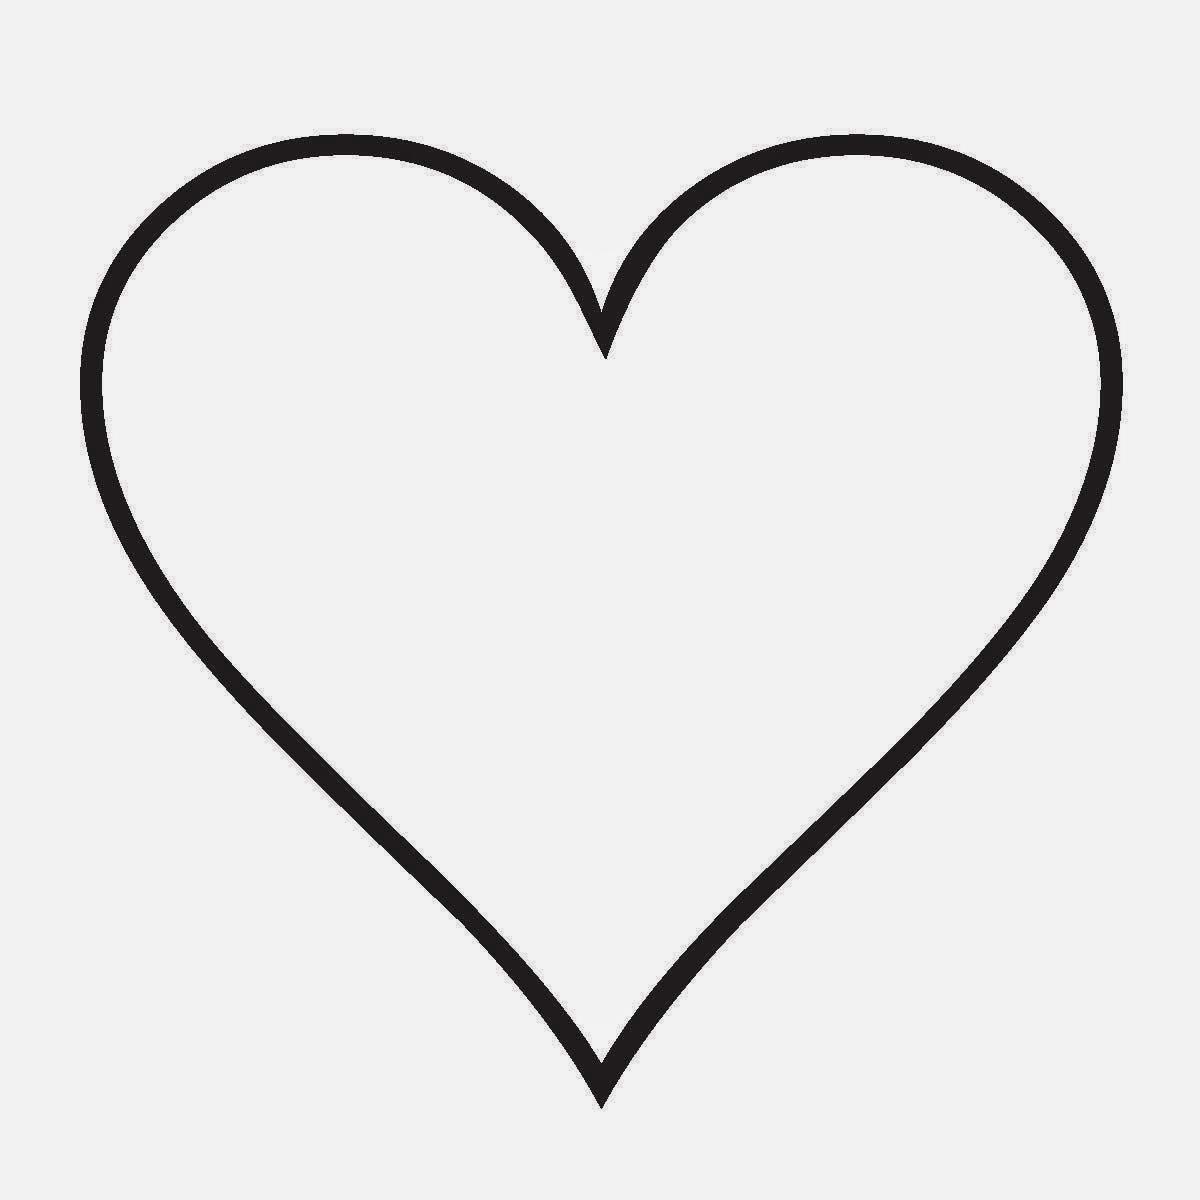 wikinew: hora de dibujar!! un corazon